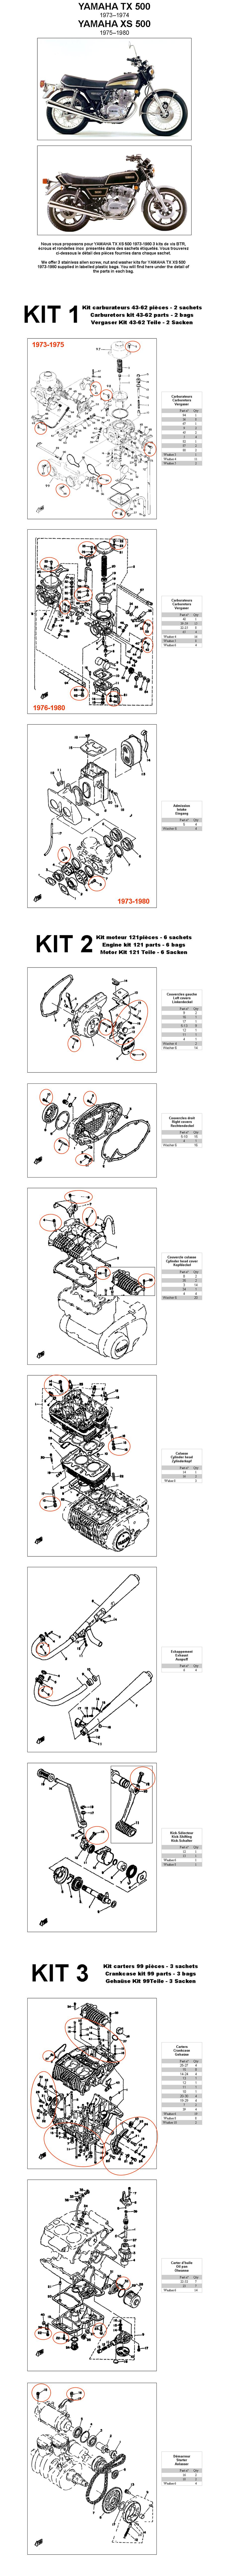 Yamaha Ttr 125 Engine Diagram Further Carburetor Diagram 1980 Yamaha